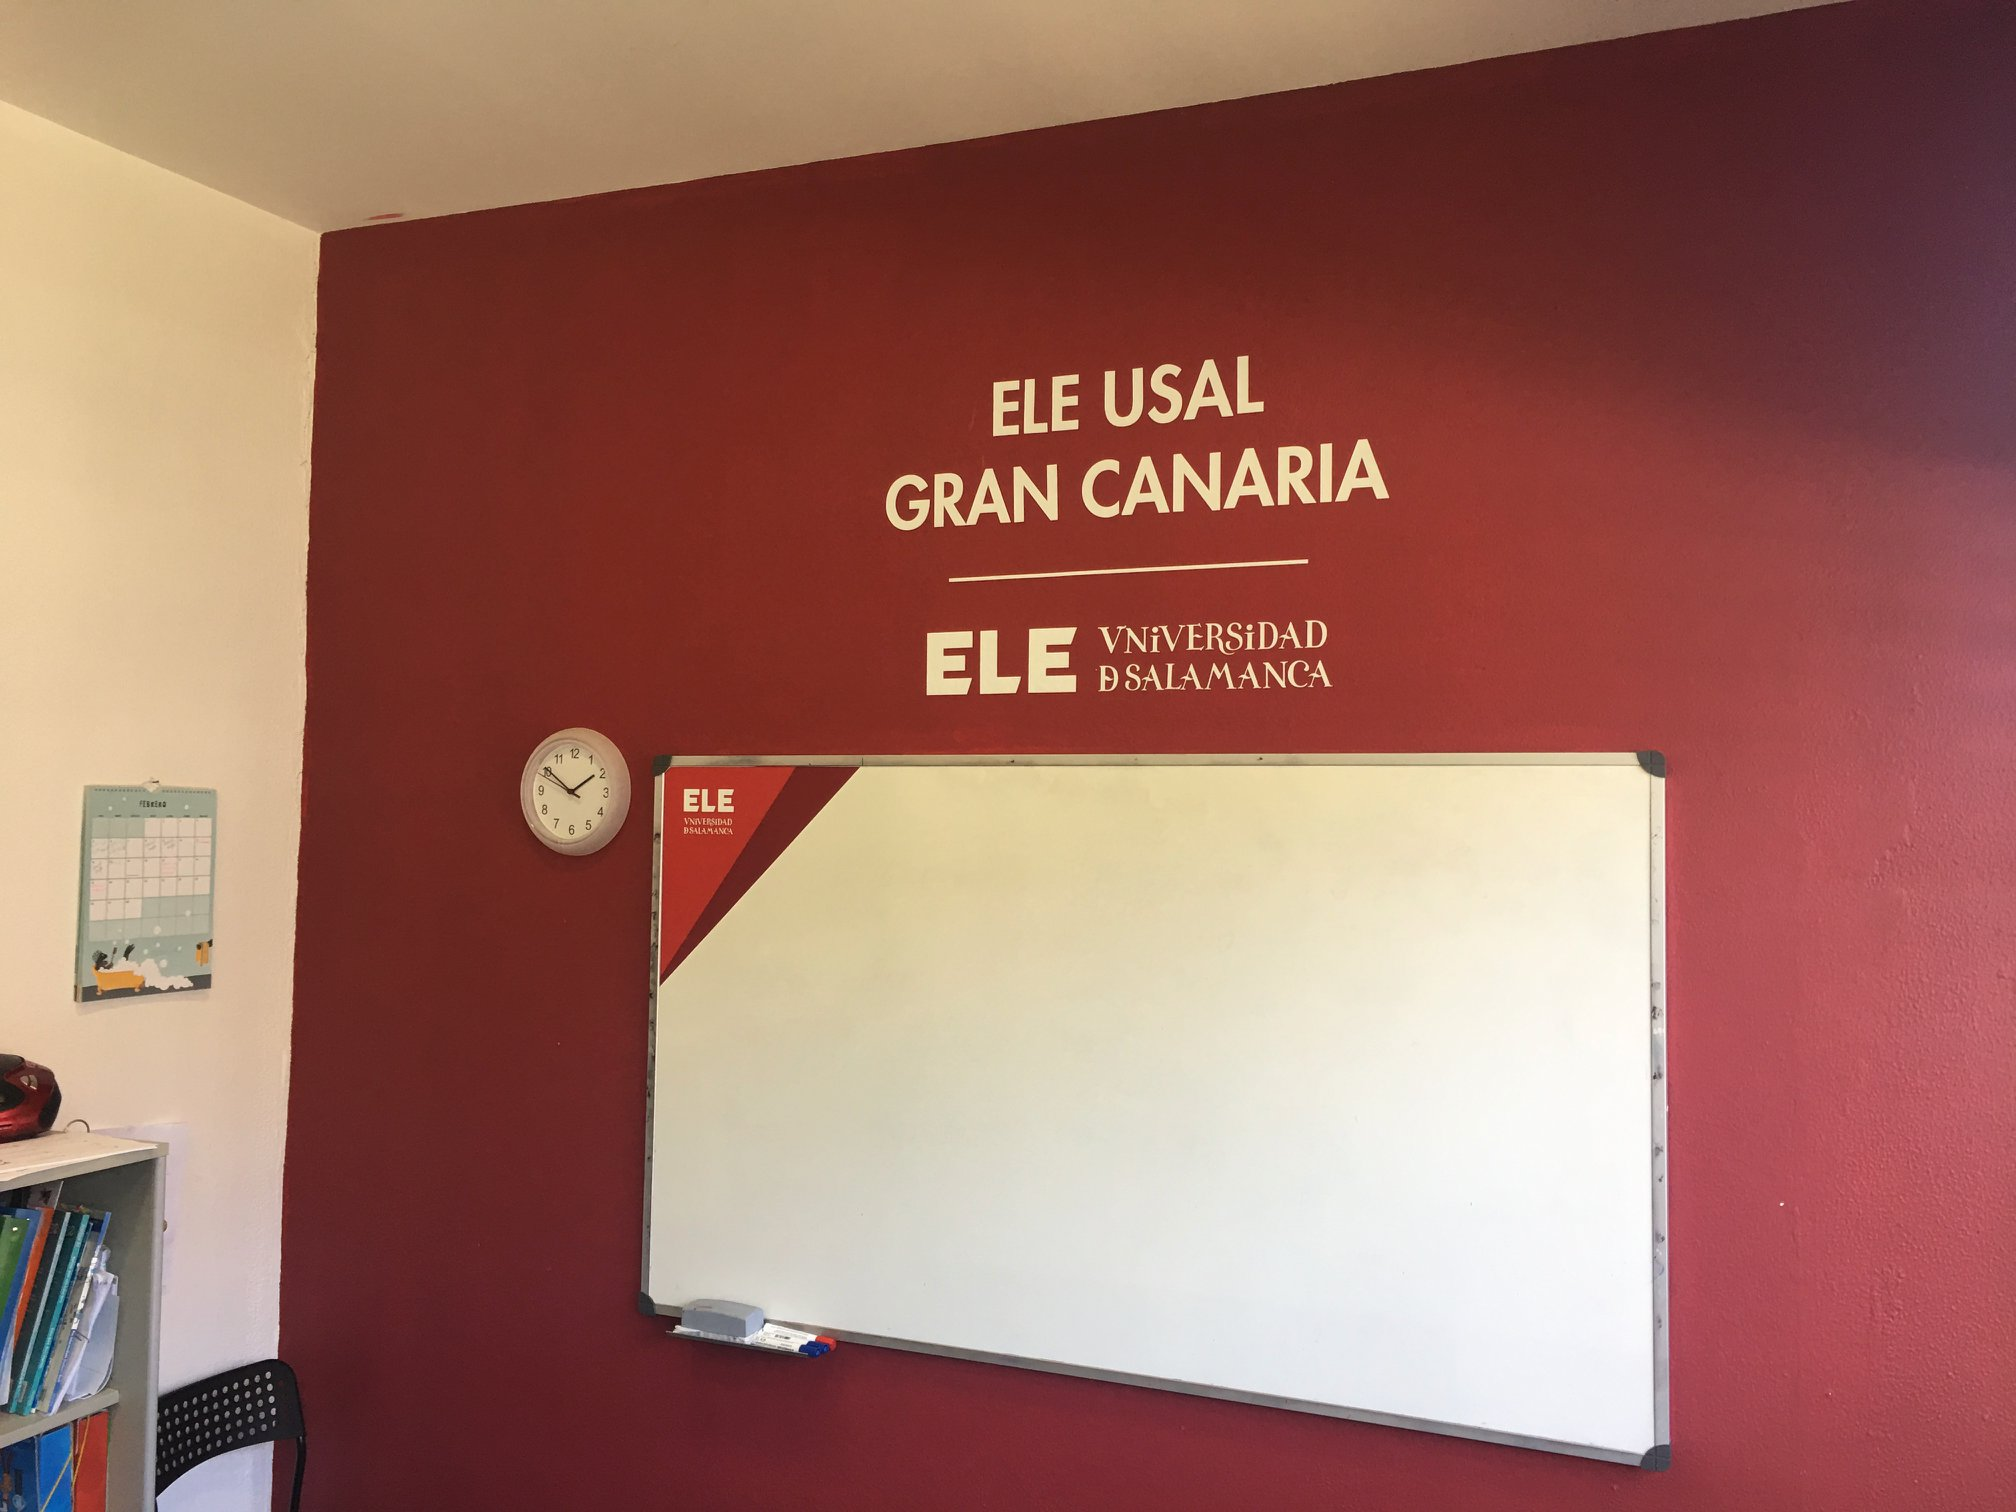 CURSO DE ESPAÑOL INTENSIVO 10